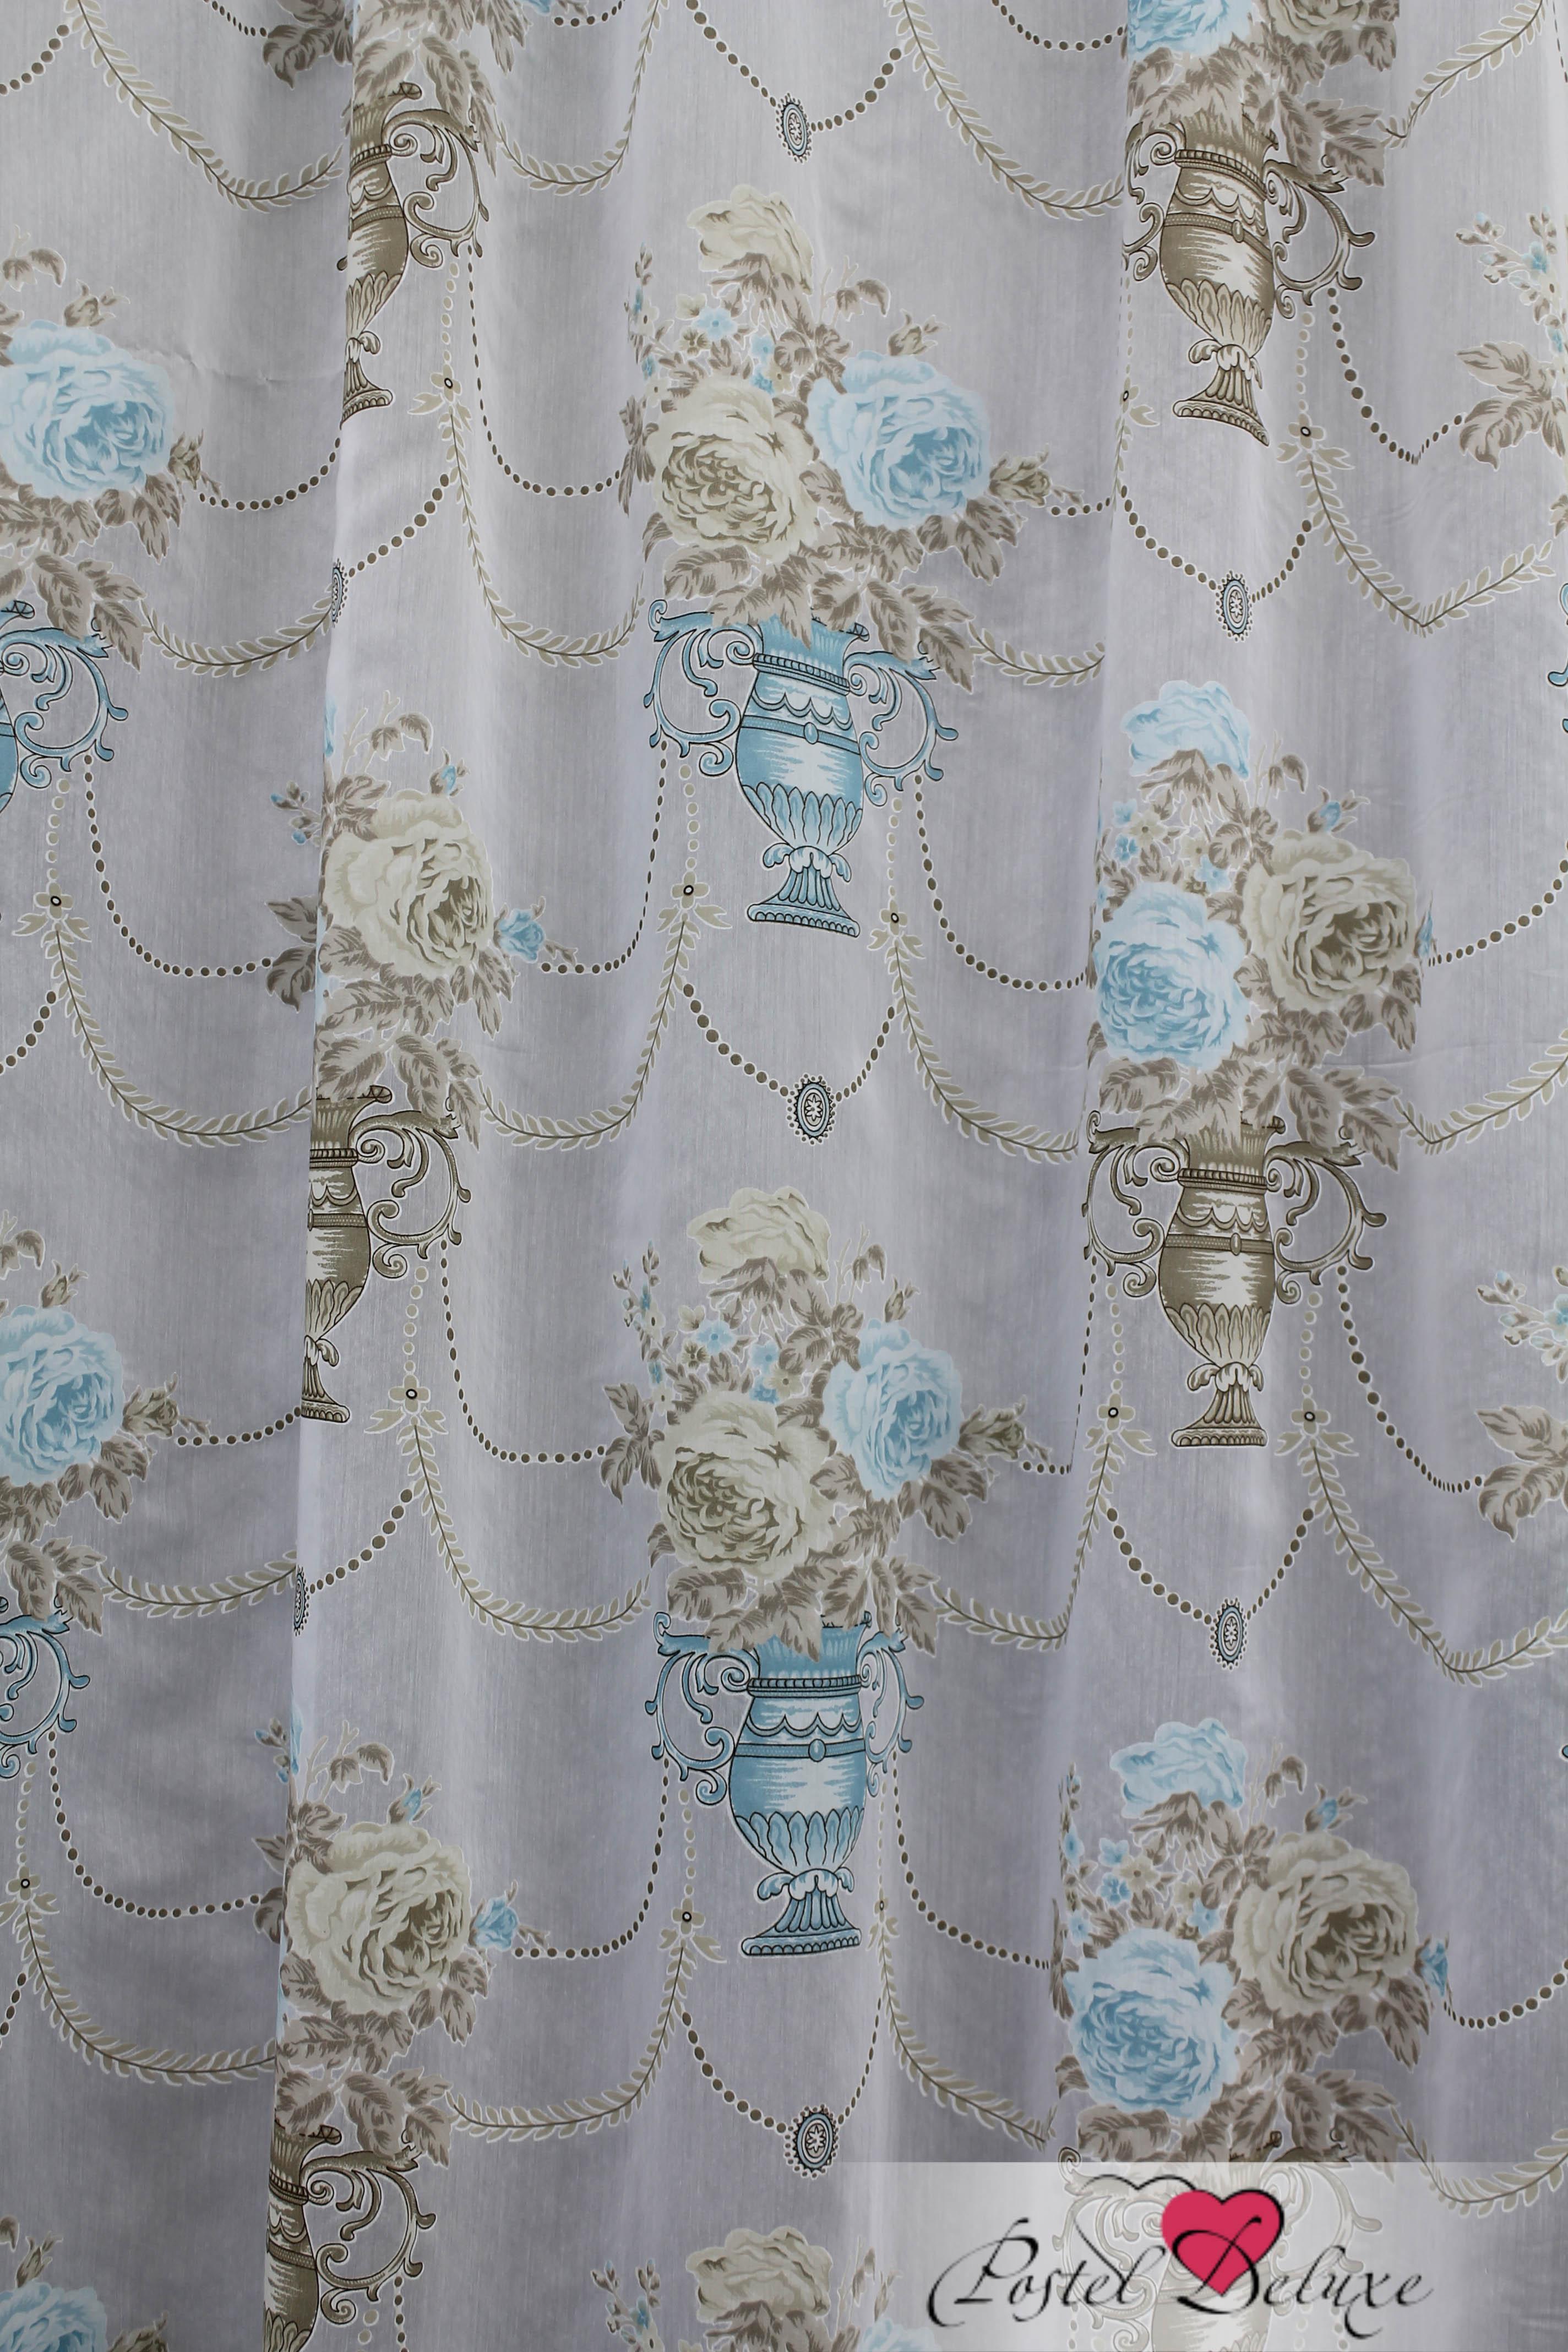 Шторы Sanpa Классические шторы Айсун Цвет: Бежево-Бирюзовый шторы tac классические шторы winx цвет персиковый 200x265 см